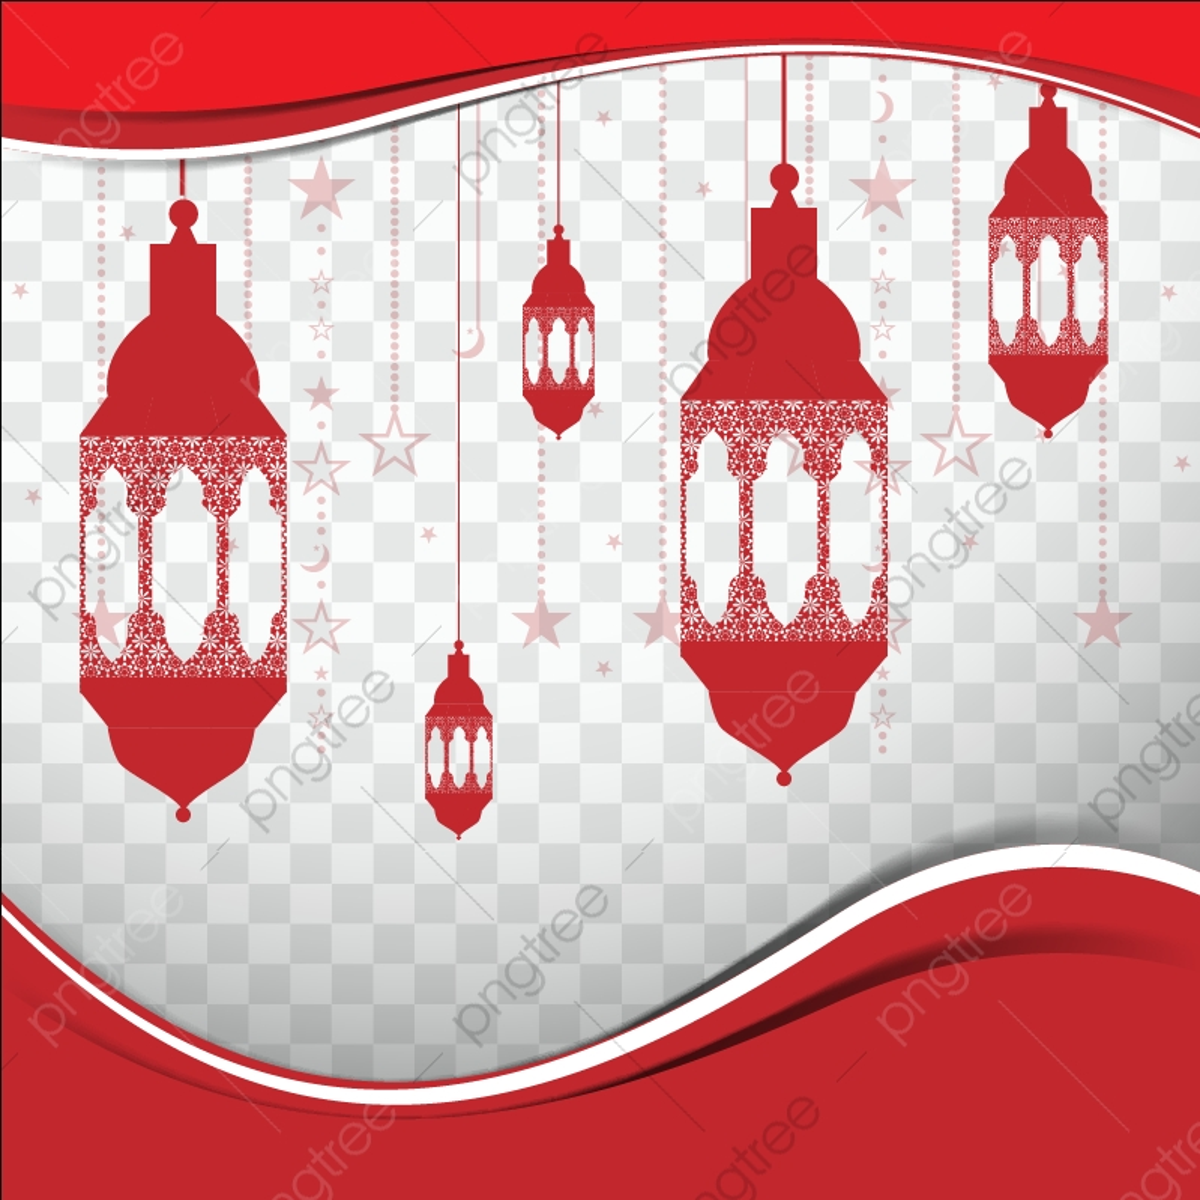 Red Design With Lanterns For Islam Ramadan Kareem, Abstract, Islamic